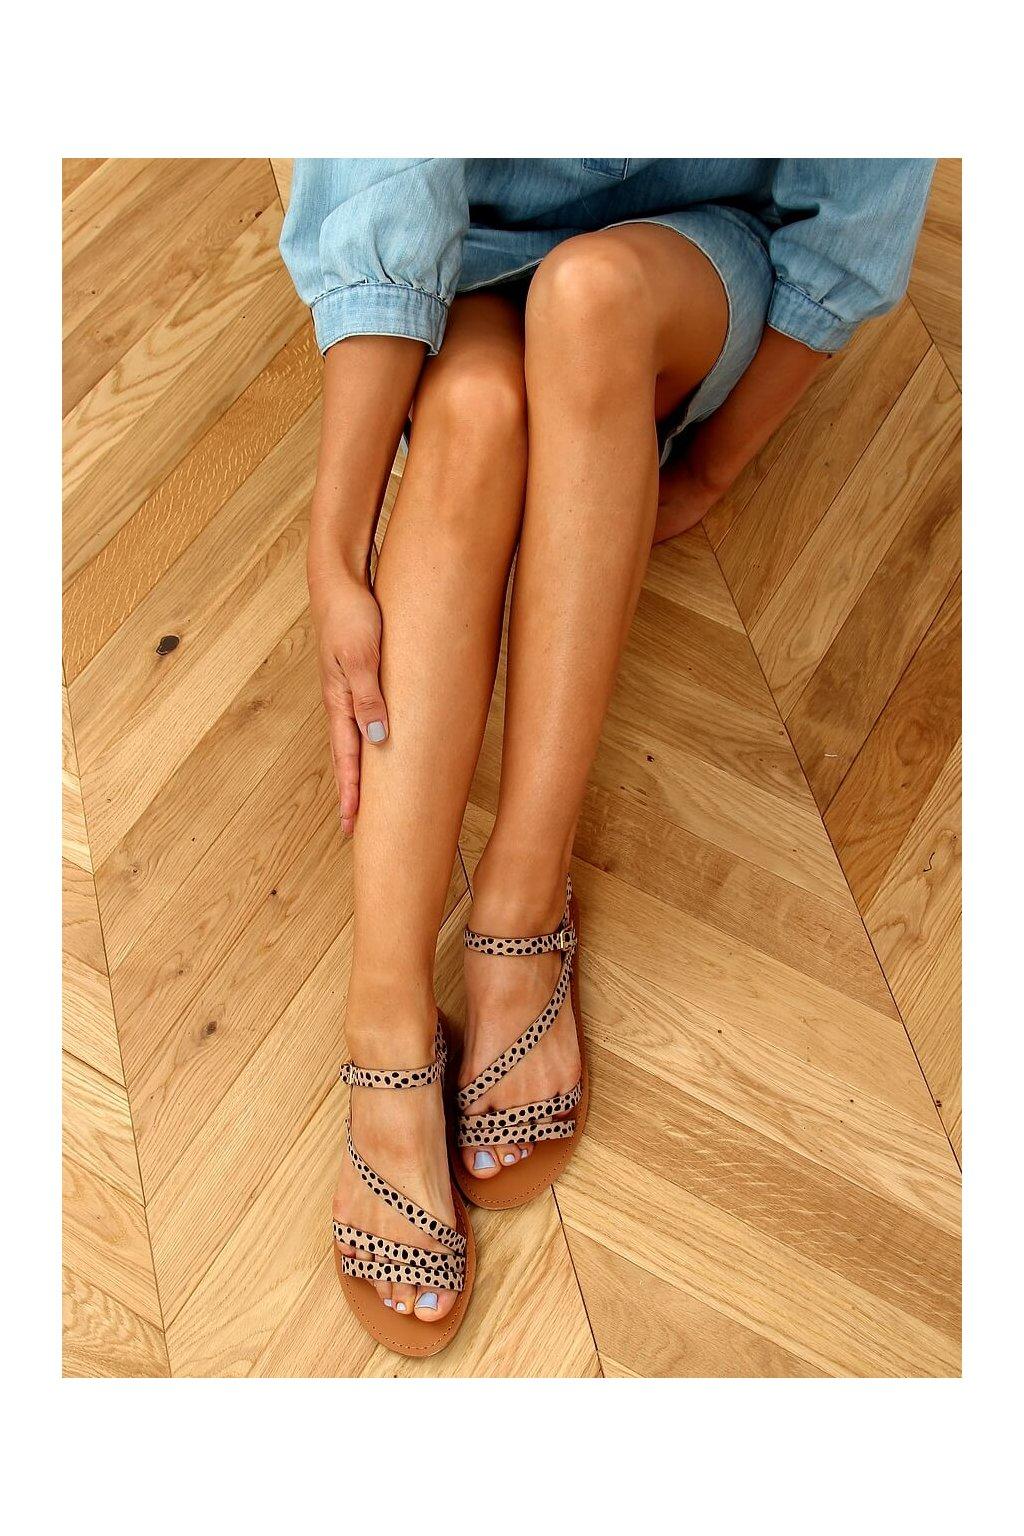 Dámske sandále hnedé na plochom podpätku BH1651-SD